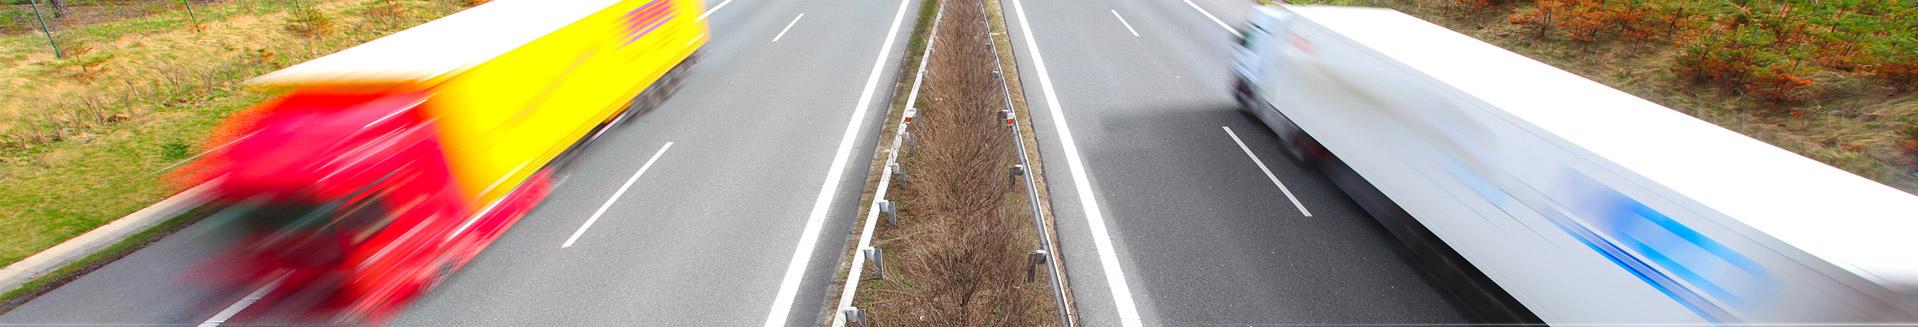 roadtrucks delatolas